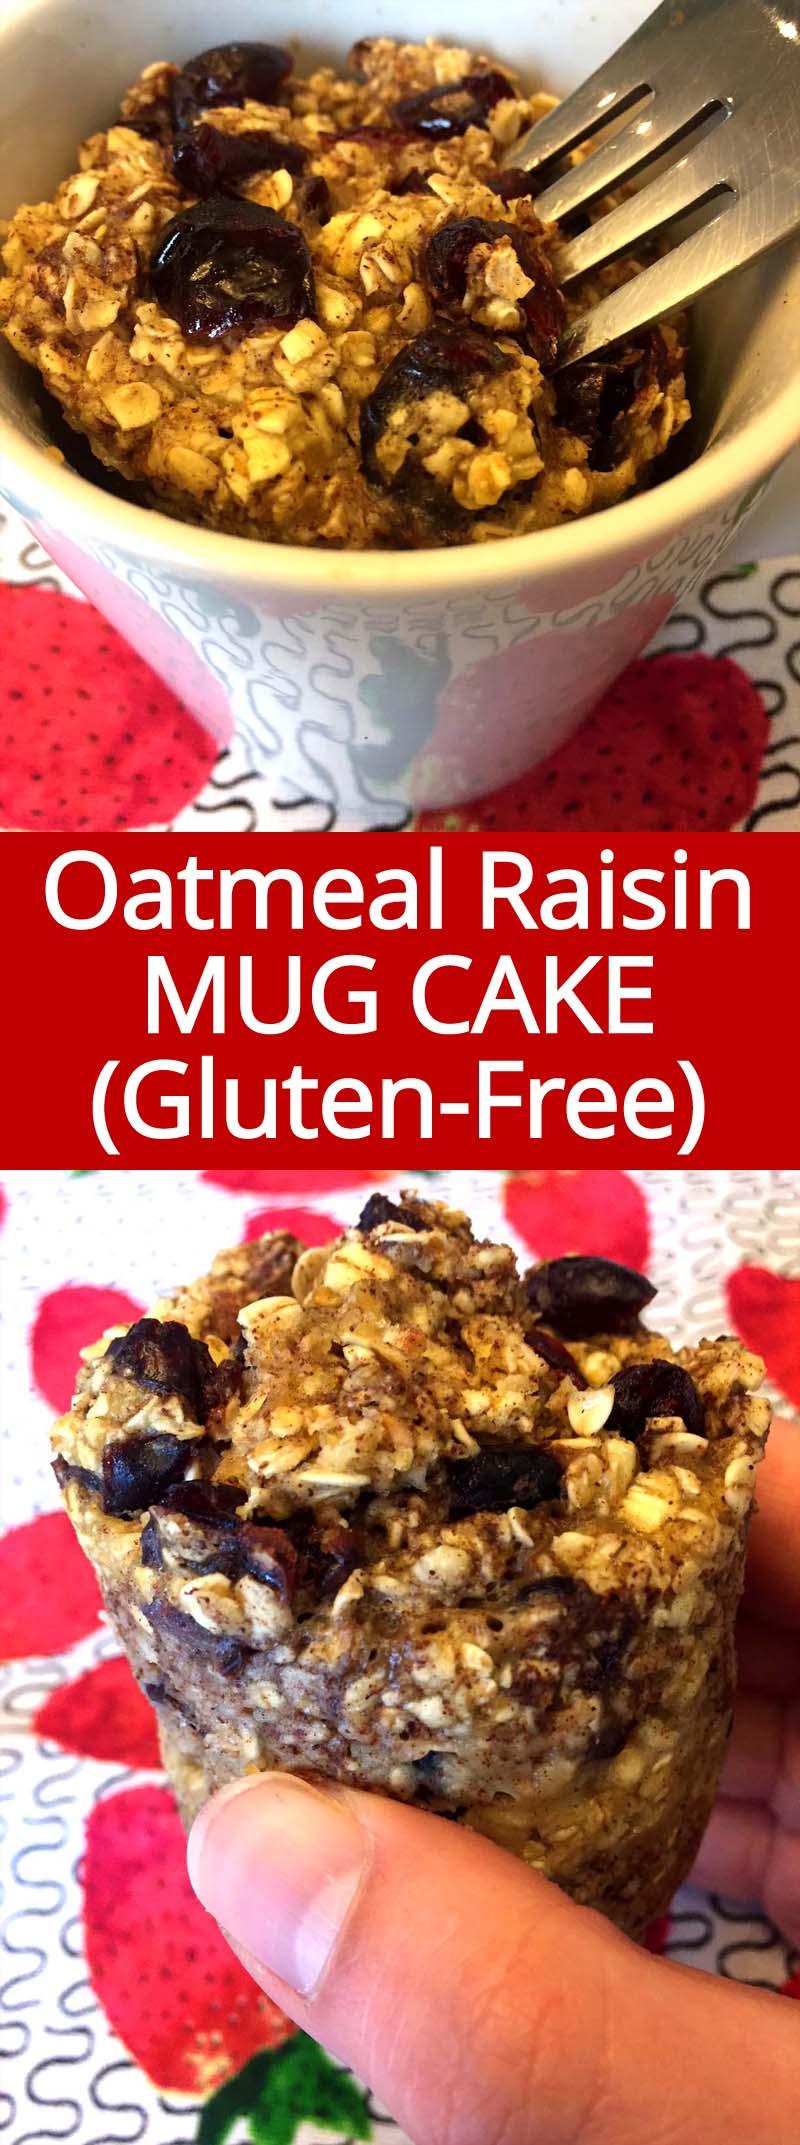 I love this gluten-free oatmeal raisin microwave mug cake! So easy to make, healthy and delicious! It's like cinnamon oatmeal raisin baked oatmeal in a mug!